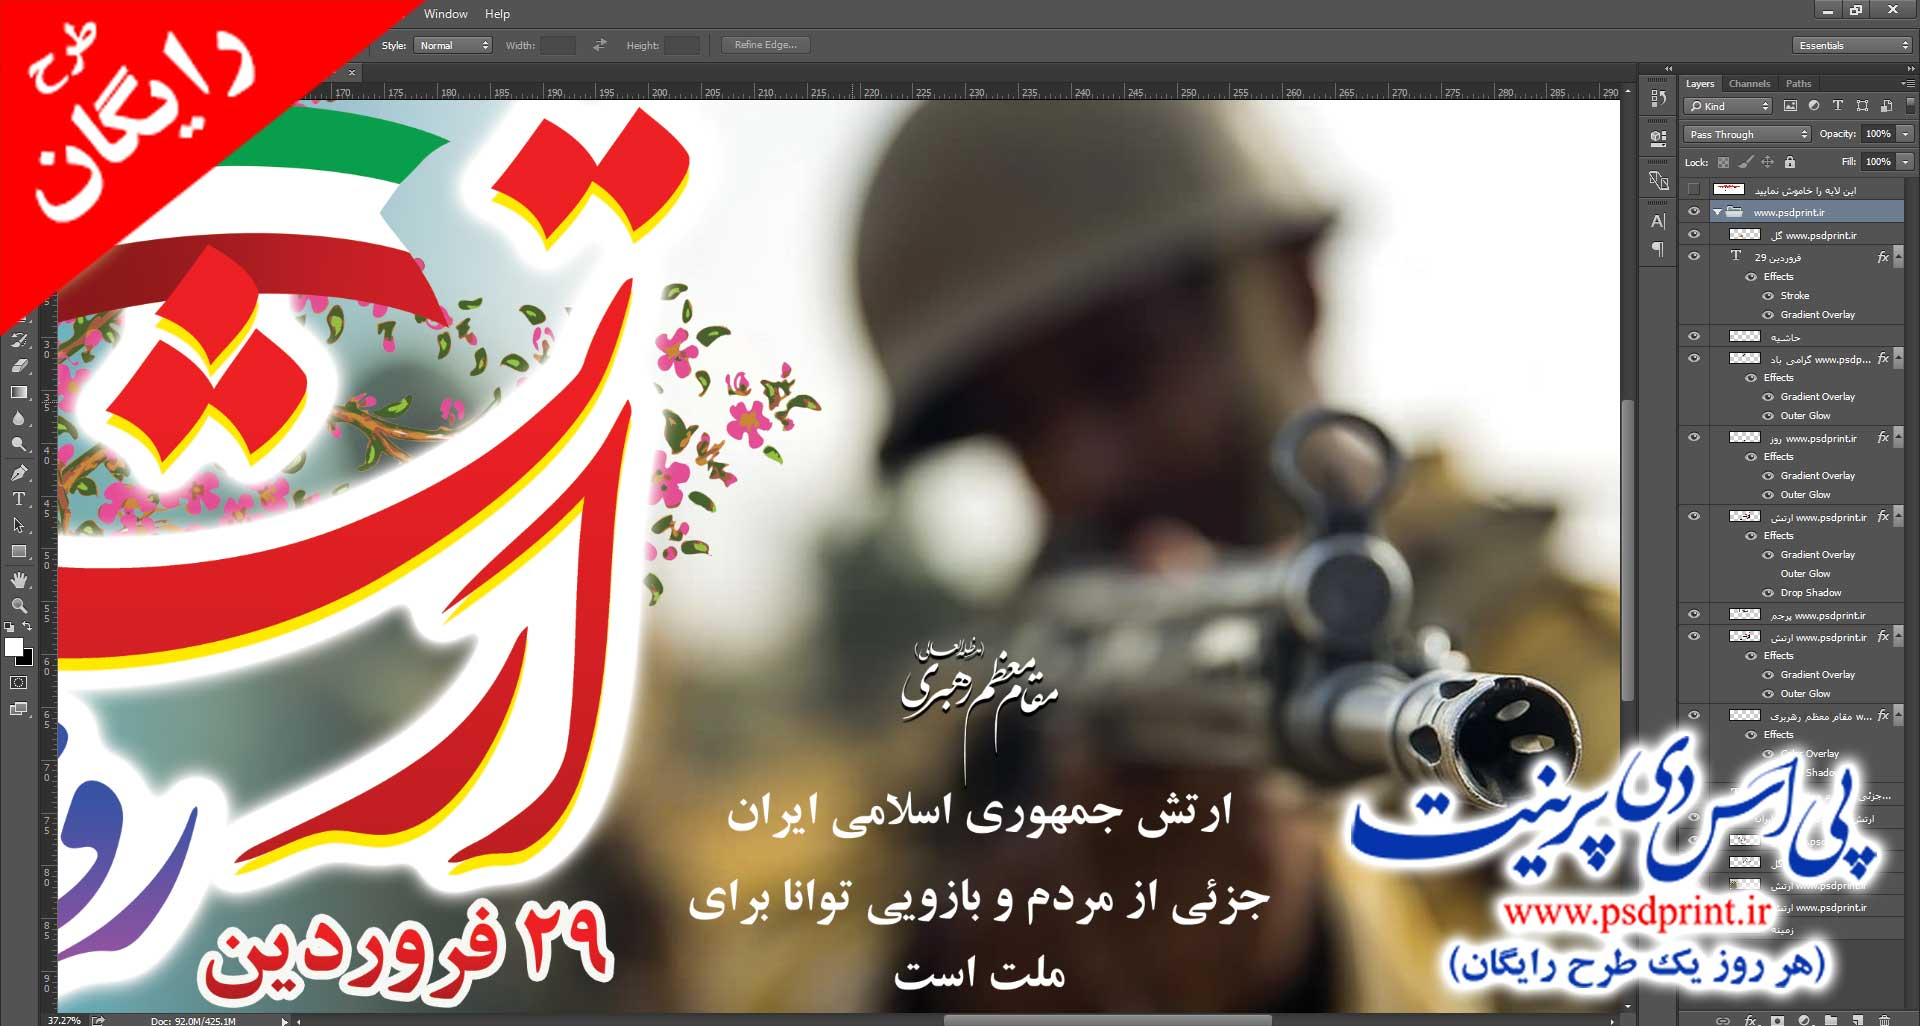 بنر تبریک روز ارتش